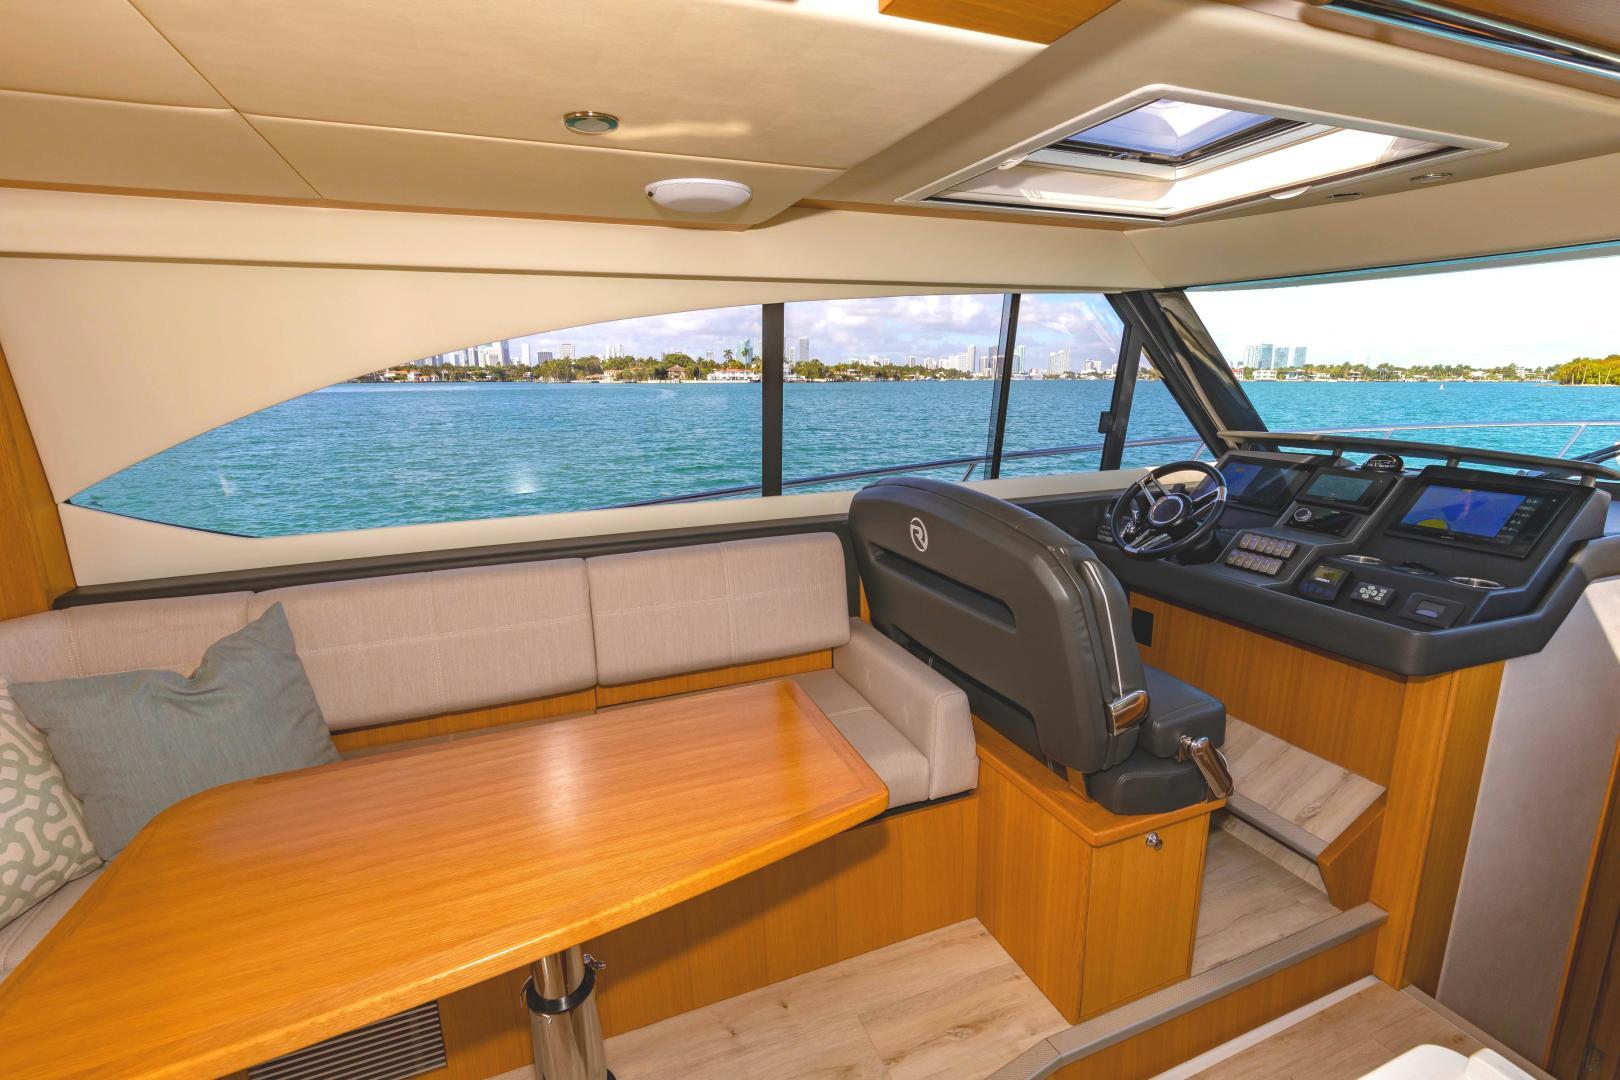 Riviera-395 SUV 2019-Ipanema Miami Beach-Florida-United States-1614904   Thumbnail